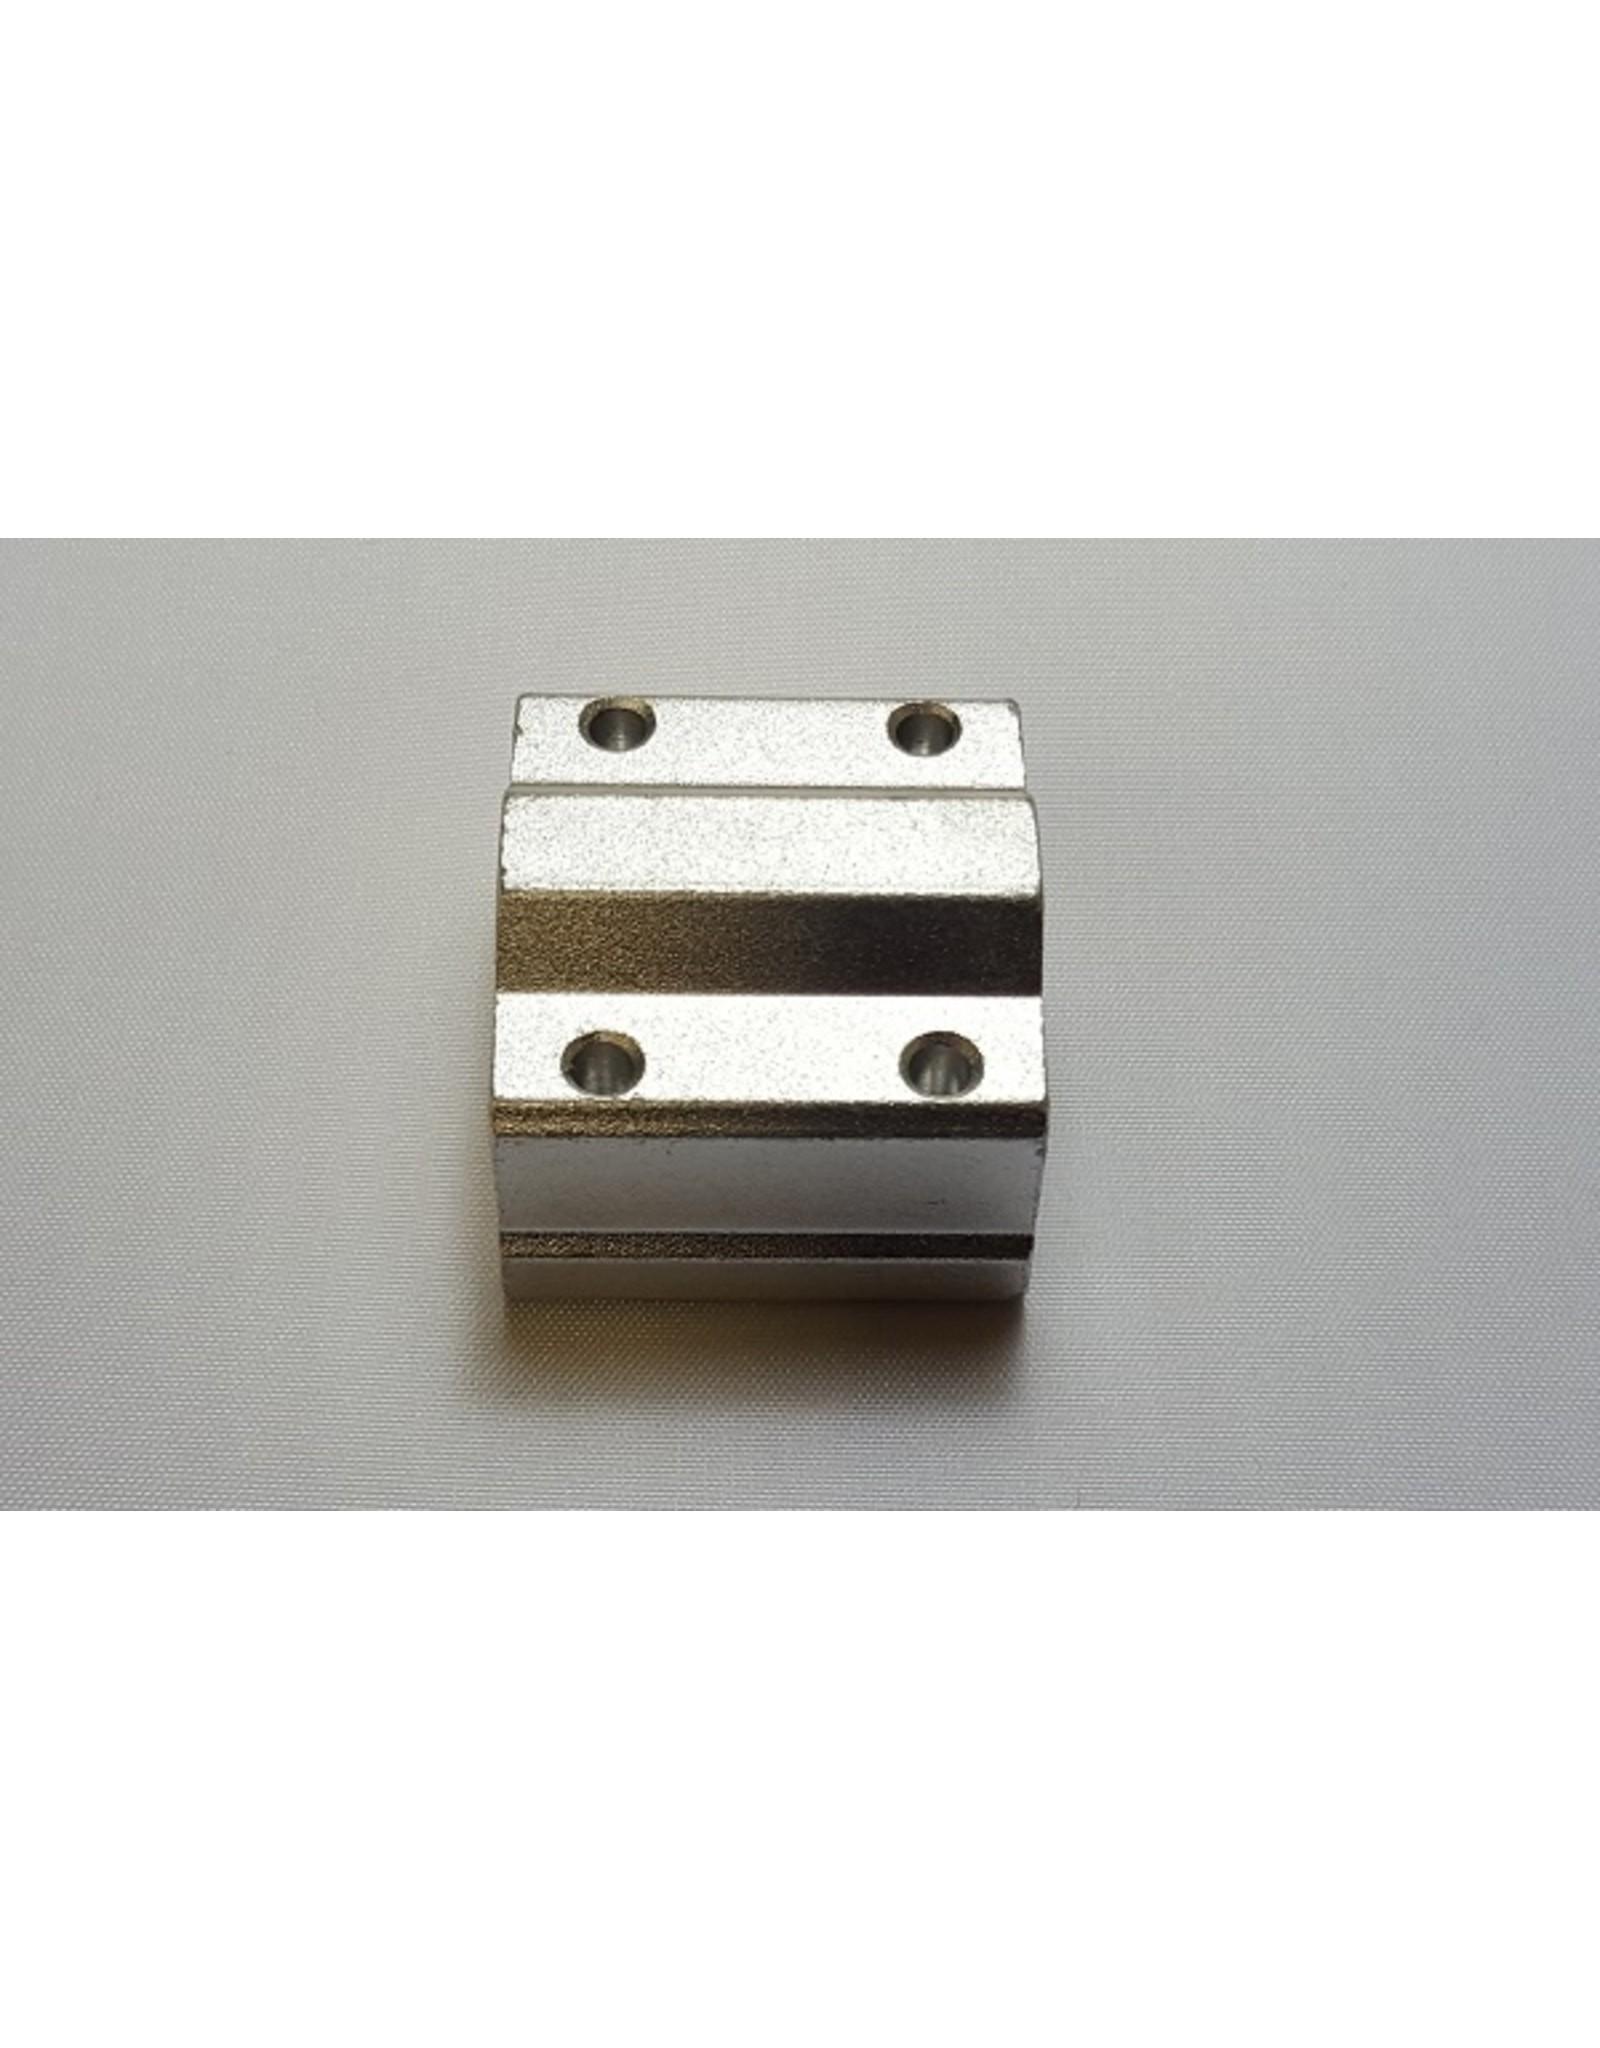 Wanhao Wanhao Duplicator i3 Slide block bearing